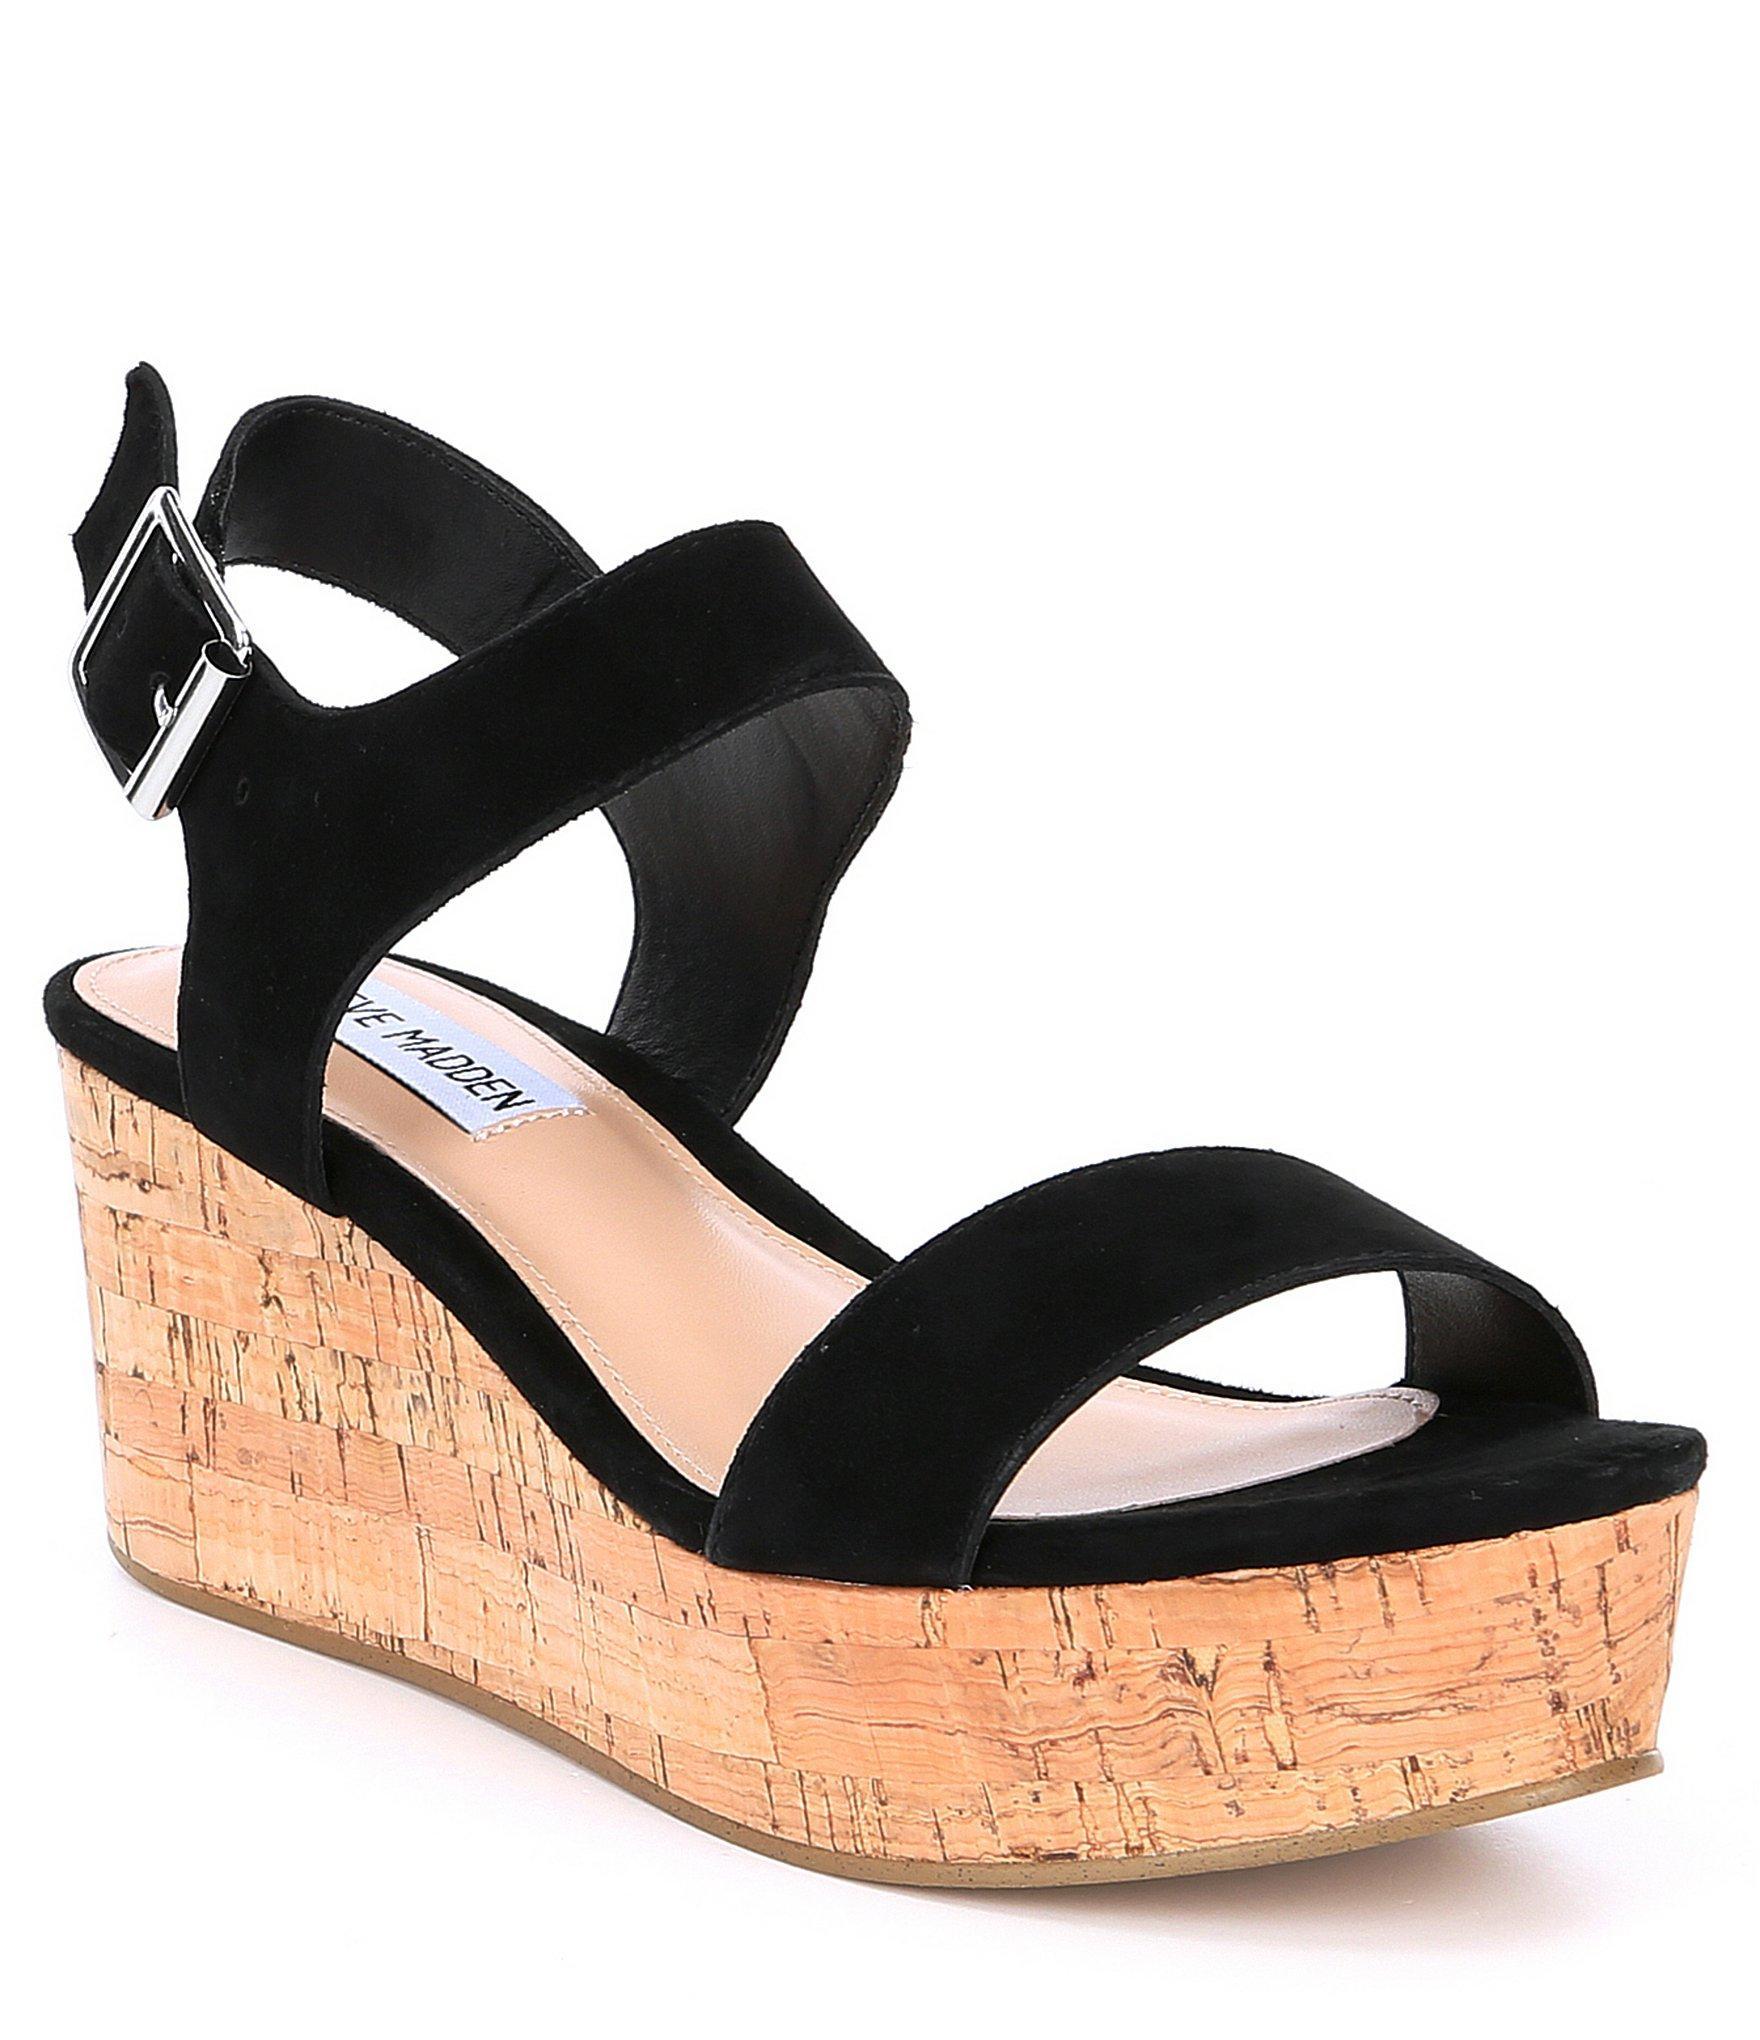 b8e7c7a2362 Lyst - Steve Madden Breathe Suede Platform Sandals in Black